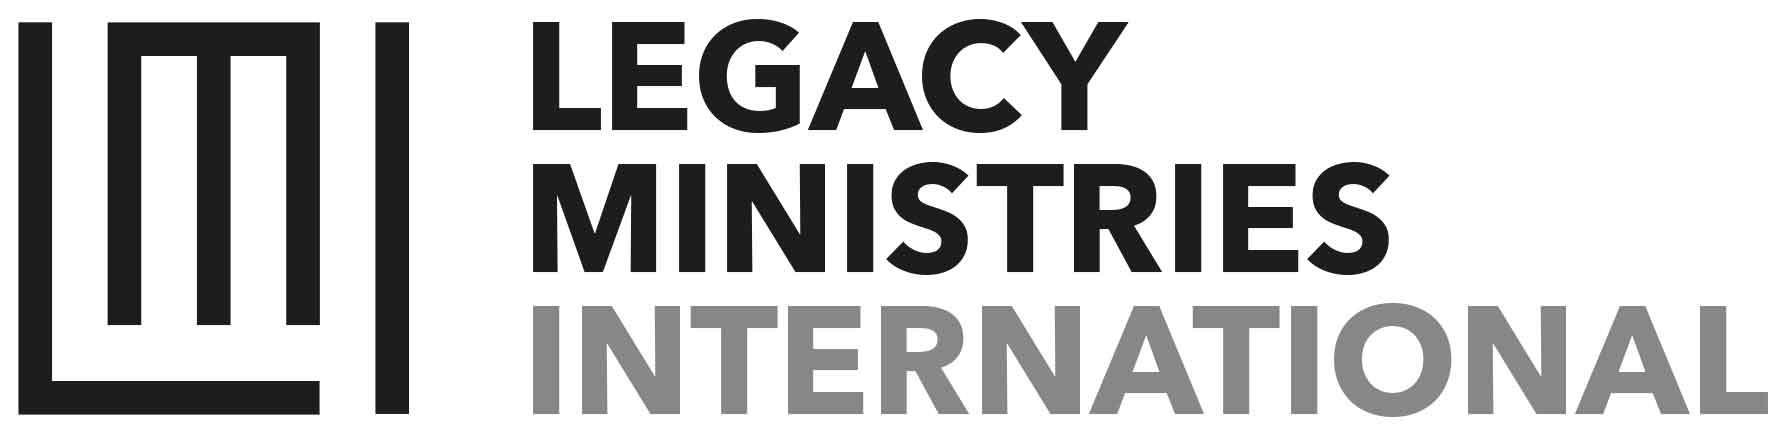 Legac-Ministries-International-Logo